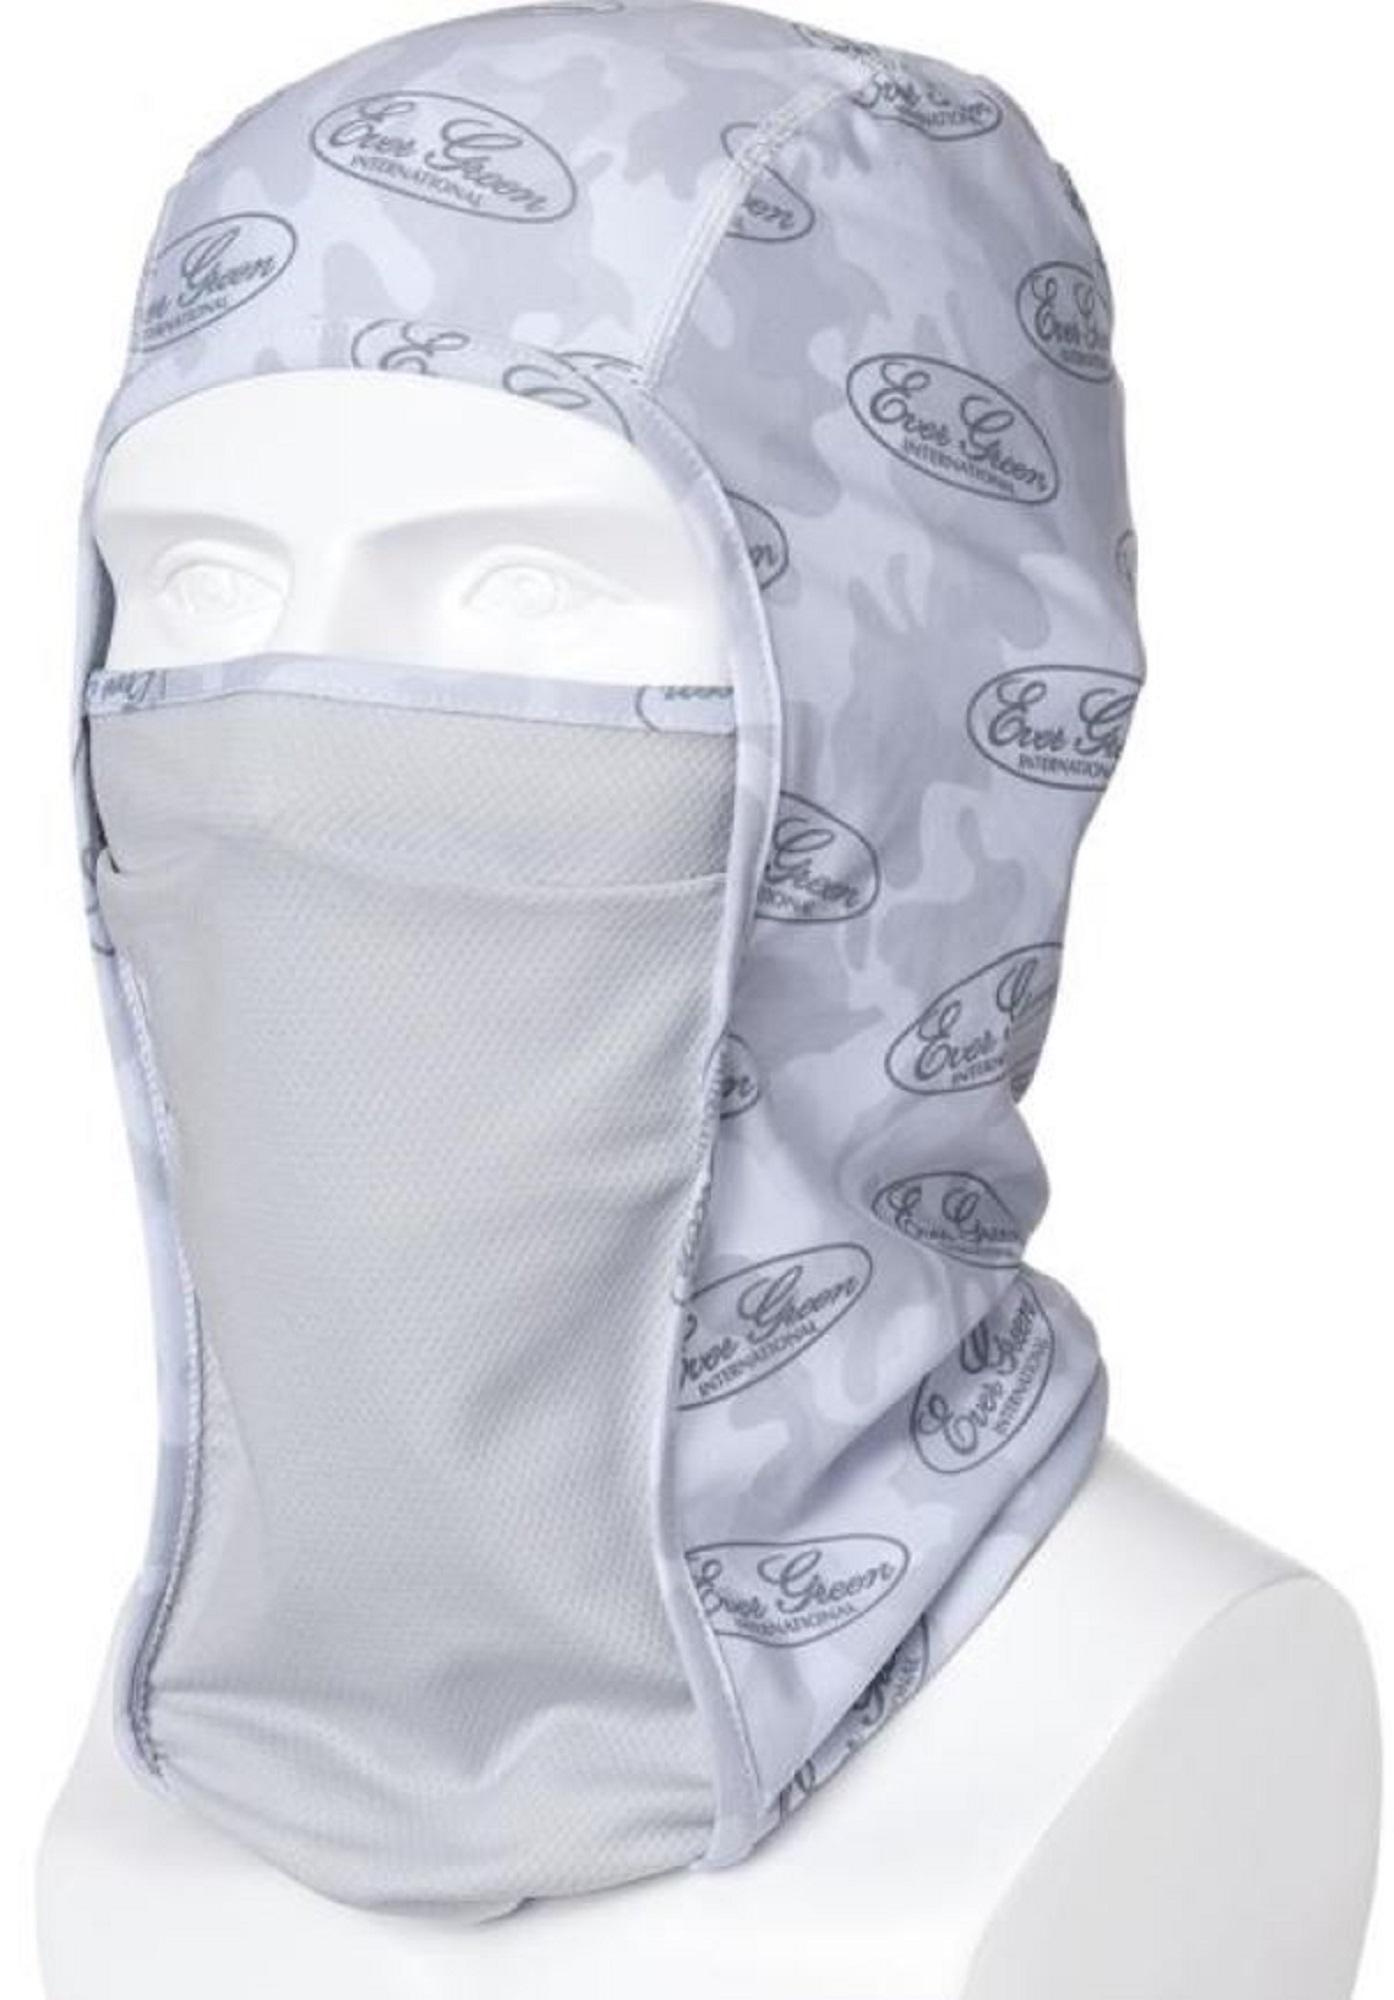 Evergreen Face Cover EG White Camou (2254)